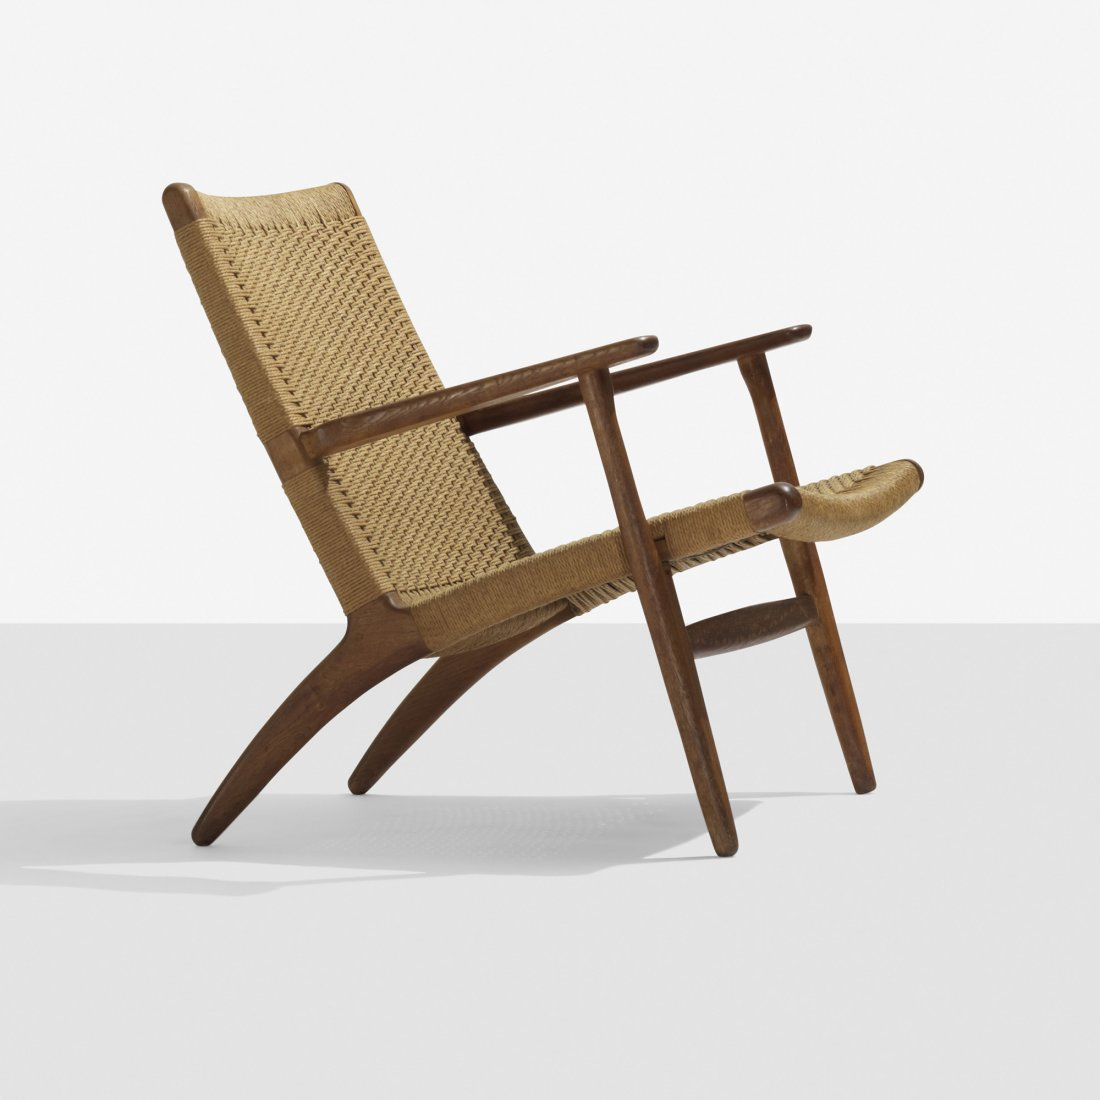 112: Hans Wegner lounge chair